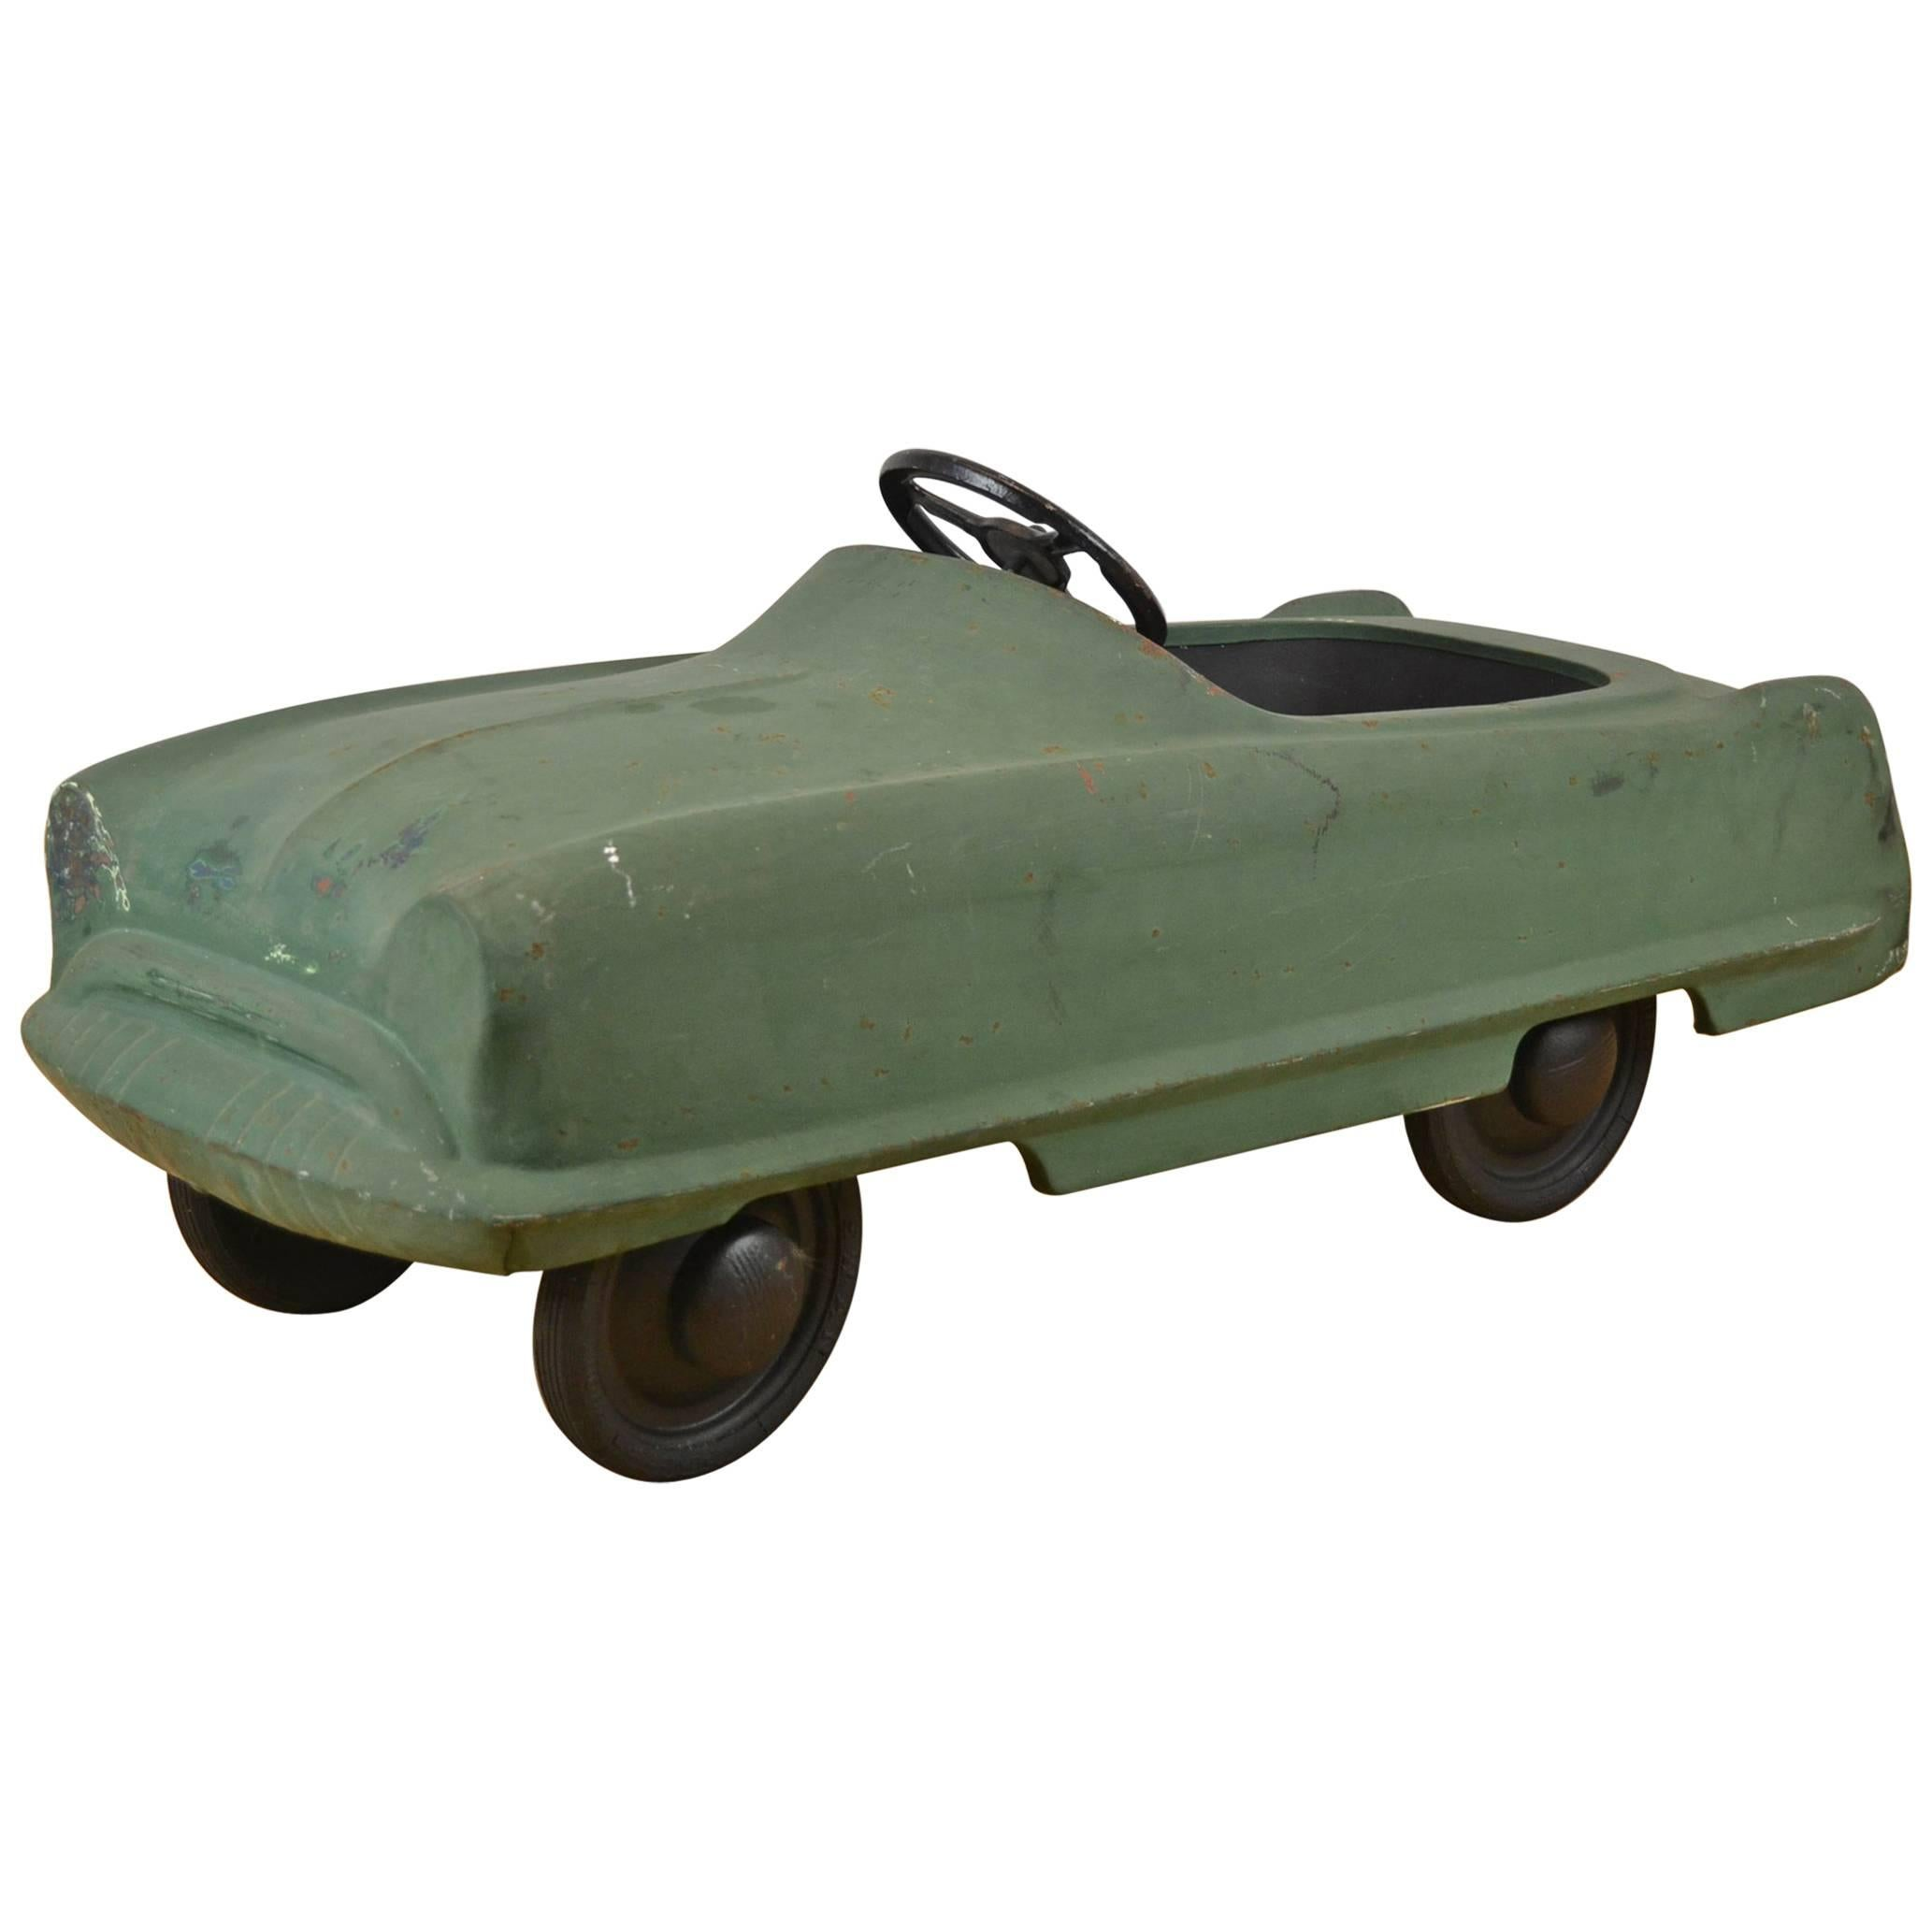 Garton Kidillac Pedal Car, Steel, 1950s , USA